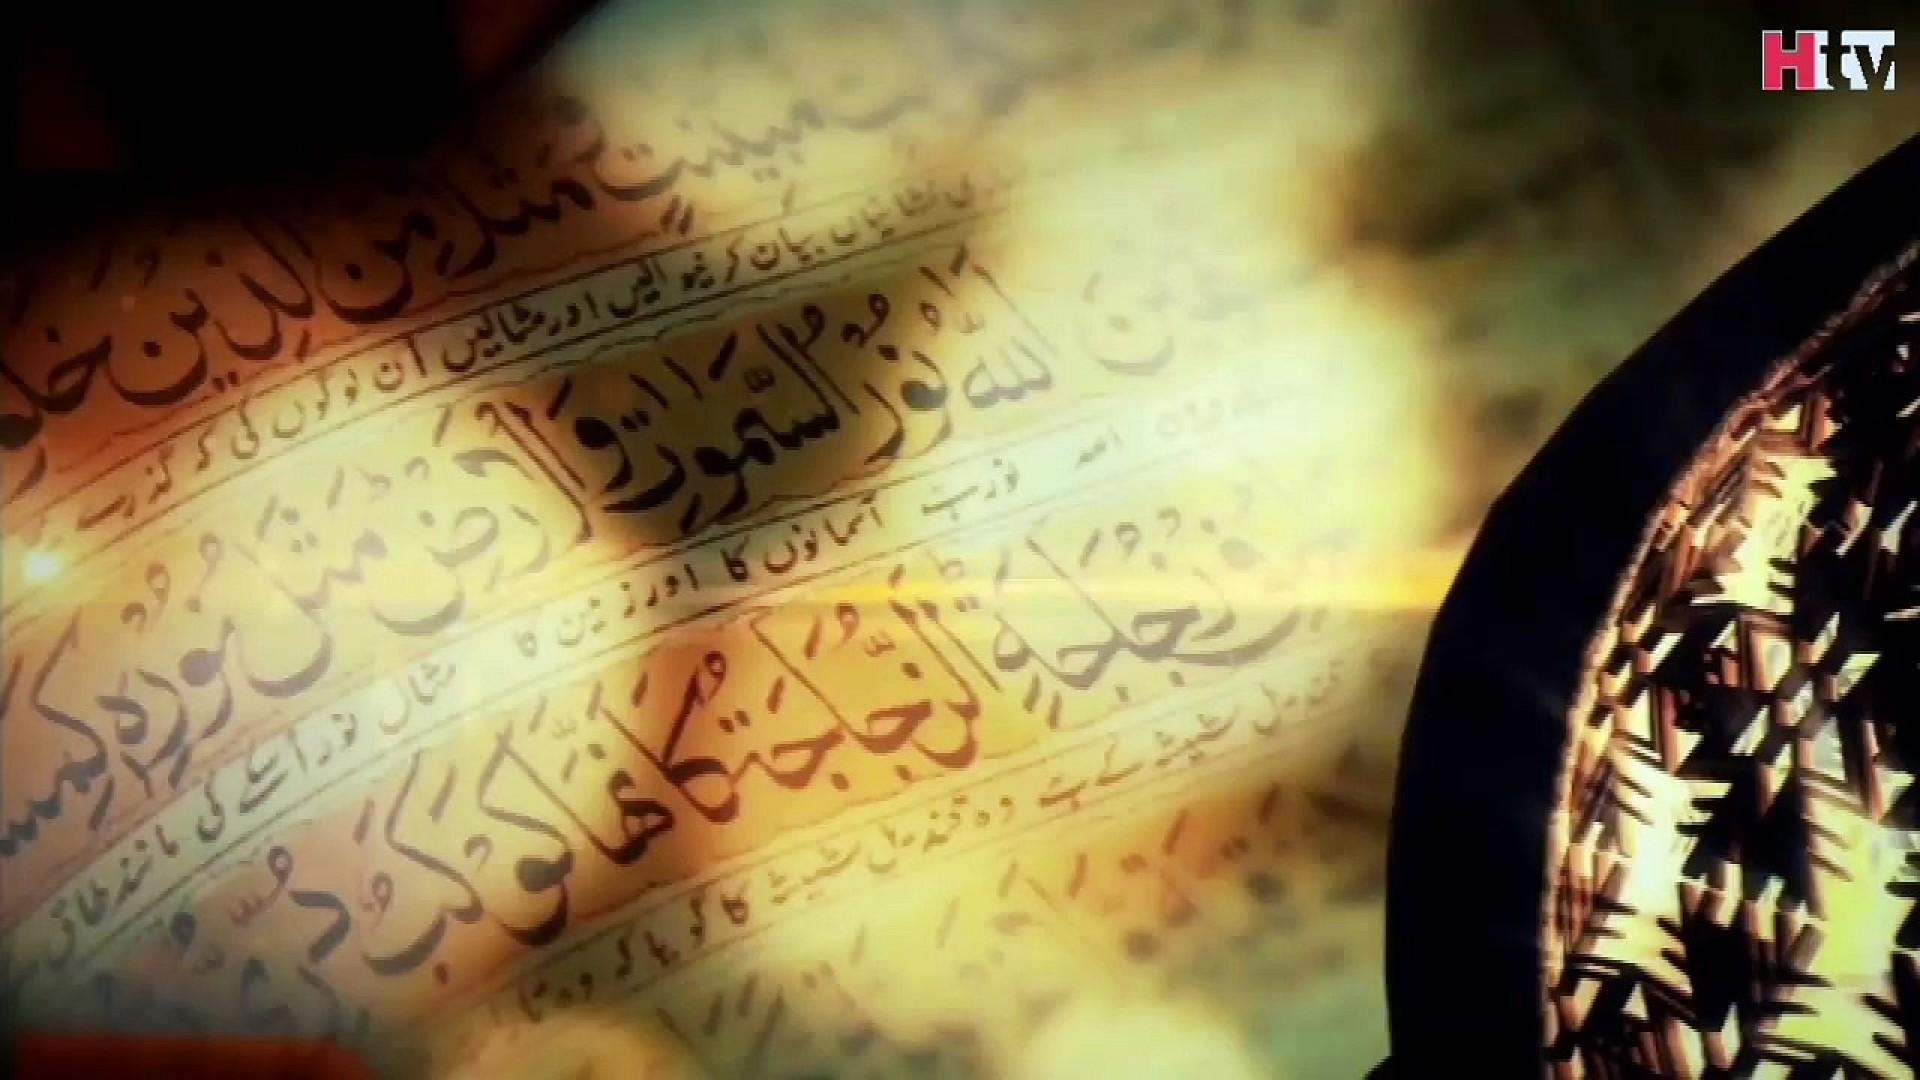 010 Harkat Mein Barkat Essay In Urdu 1280x720 Ute Amazing On Topic Hai Short 1920